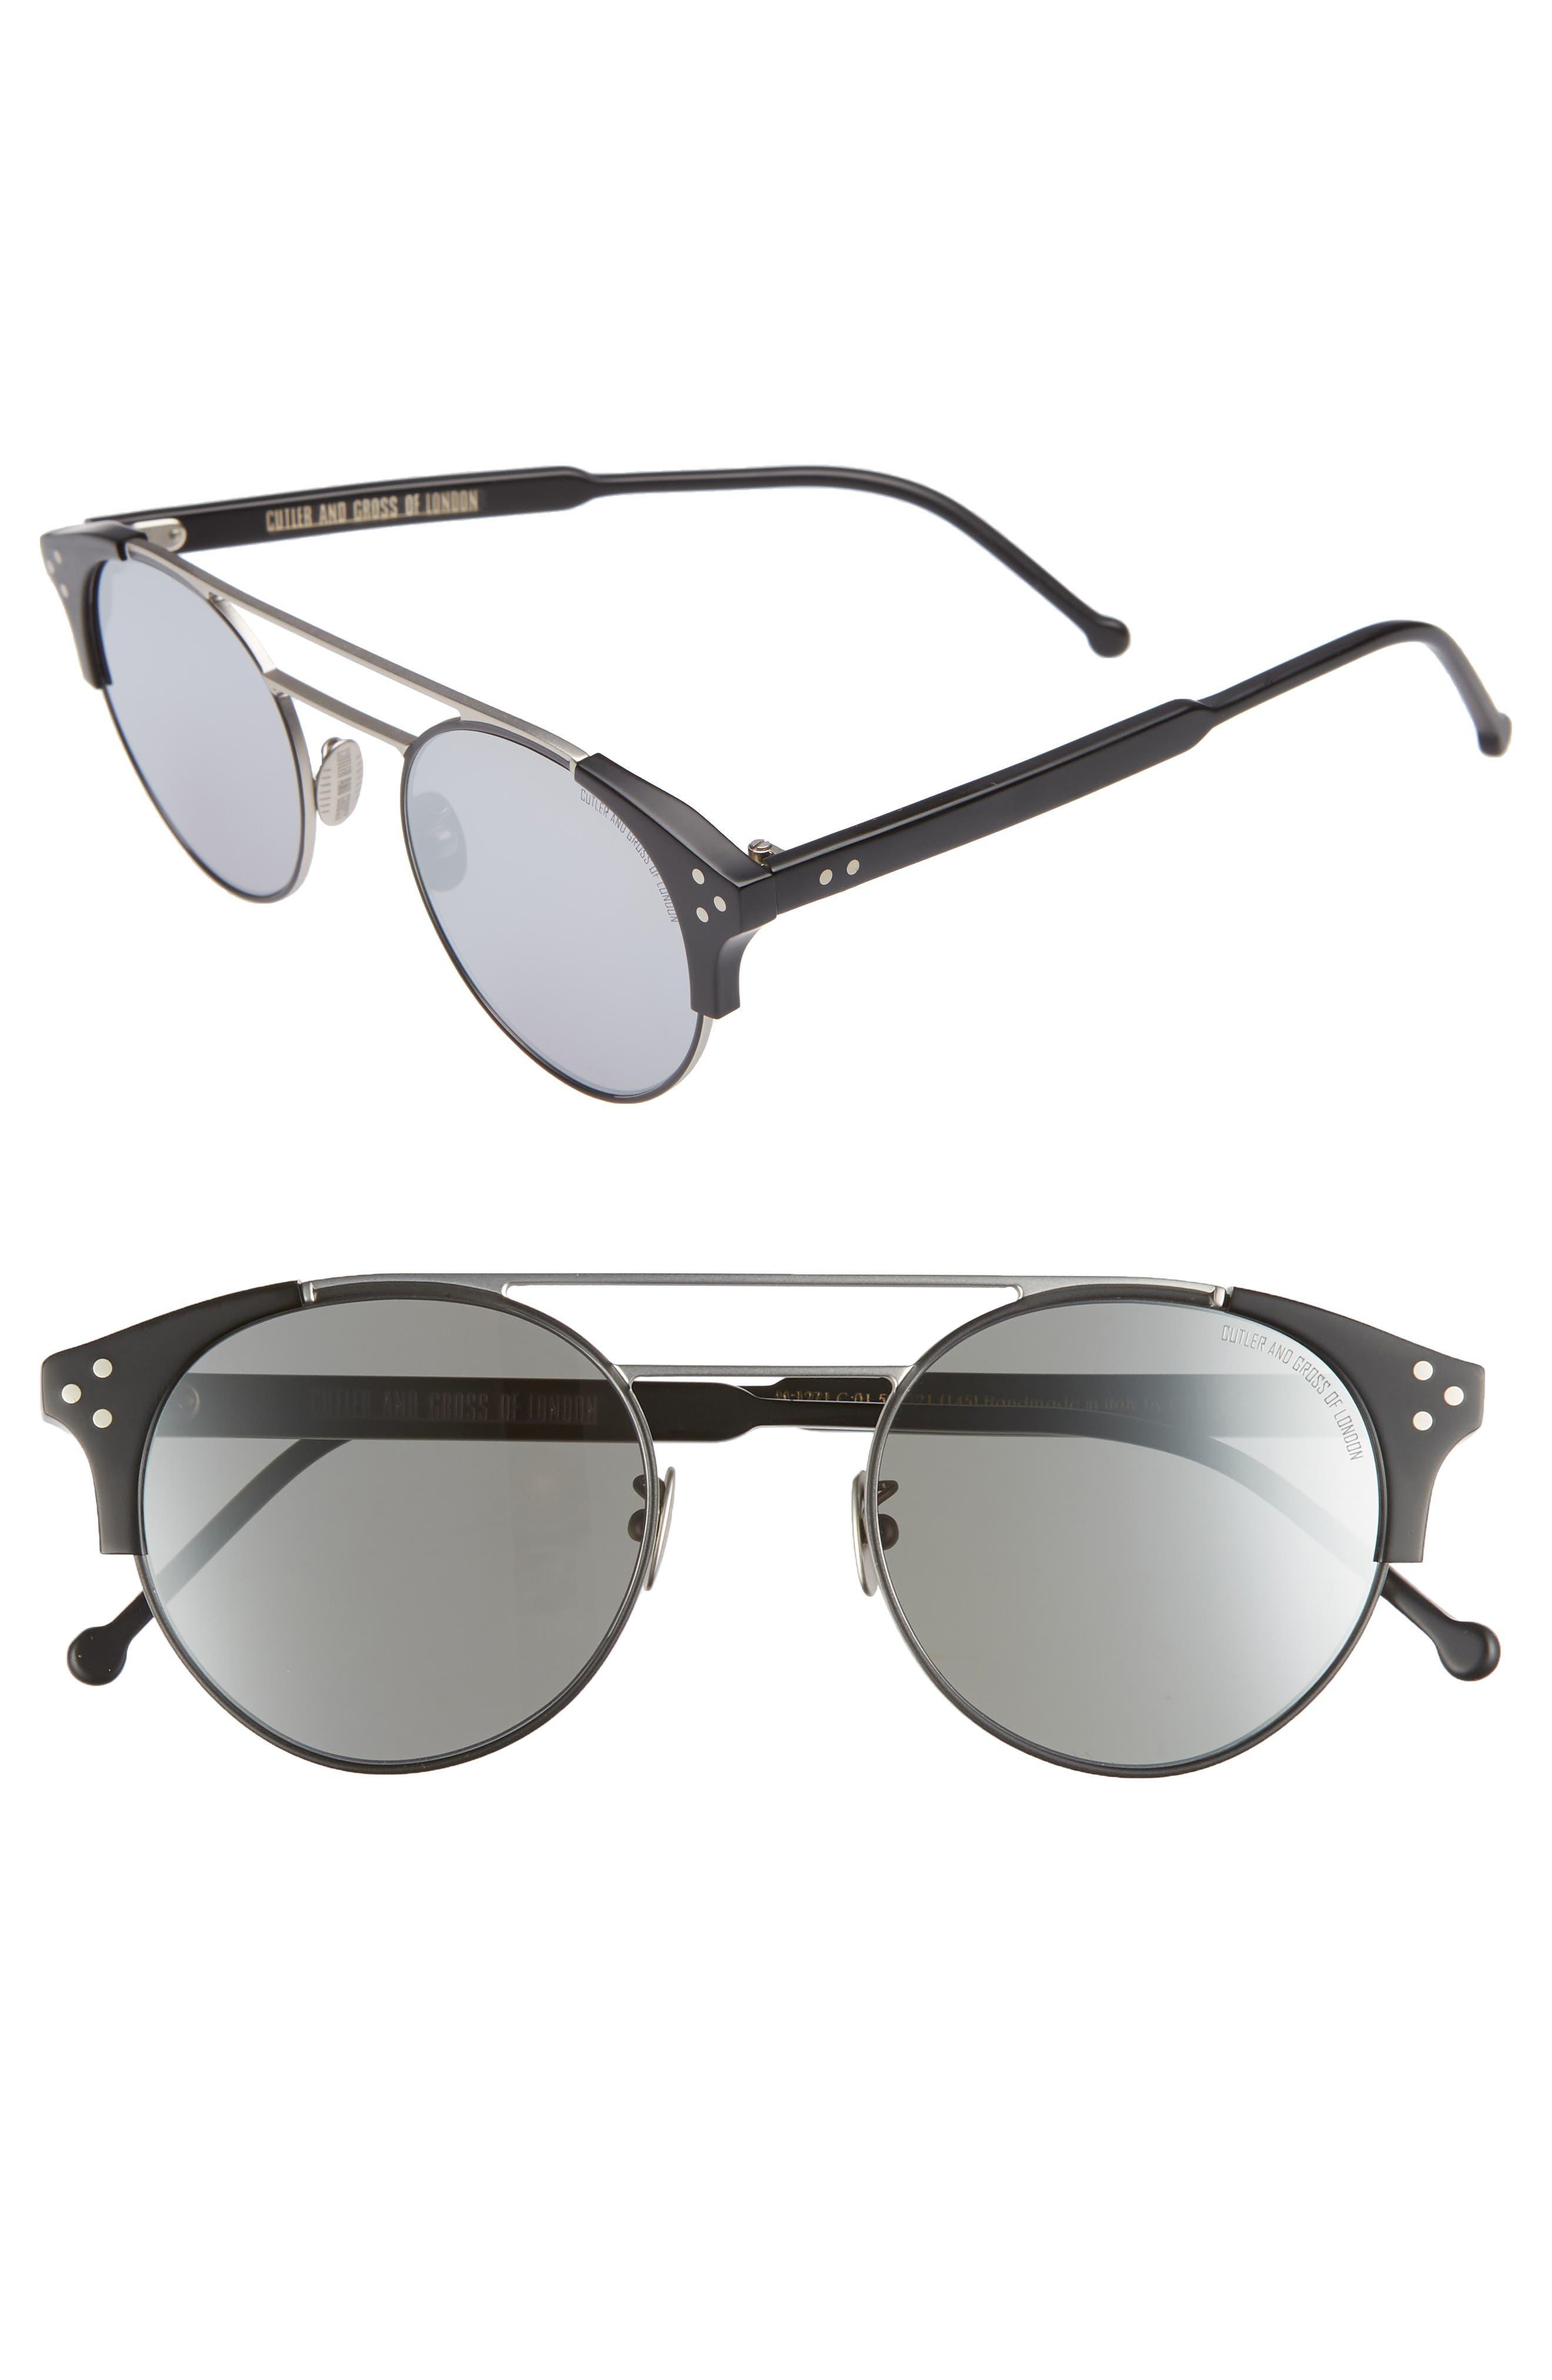 50mm Polarized Round Sunglasses,                             Main thumbnail 1, color,                             PALLADIUM AND BLACK/ SILVER